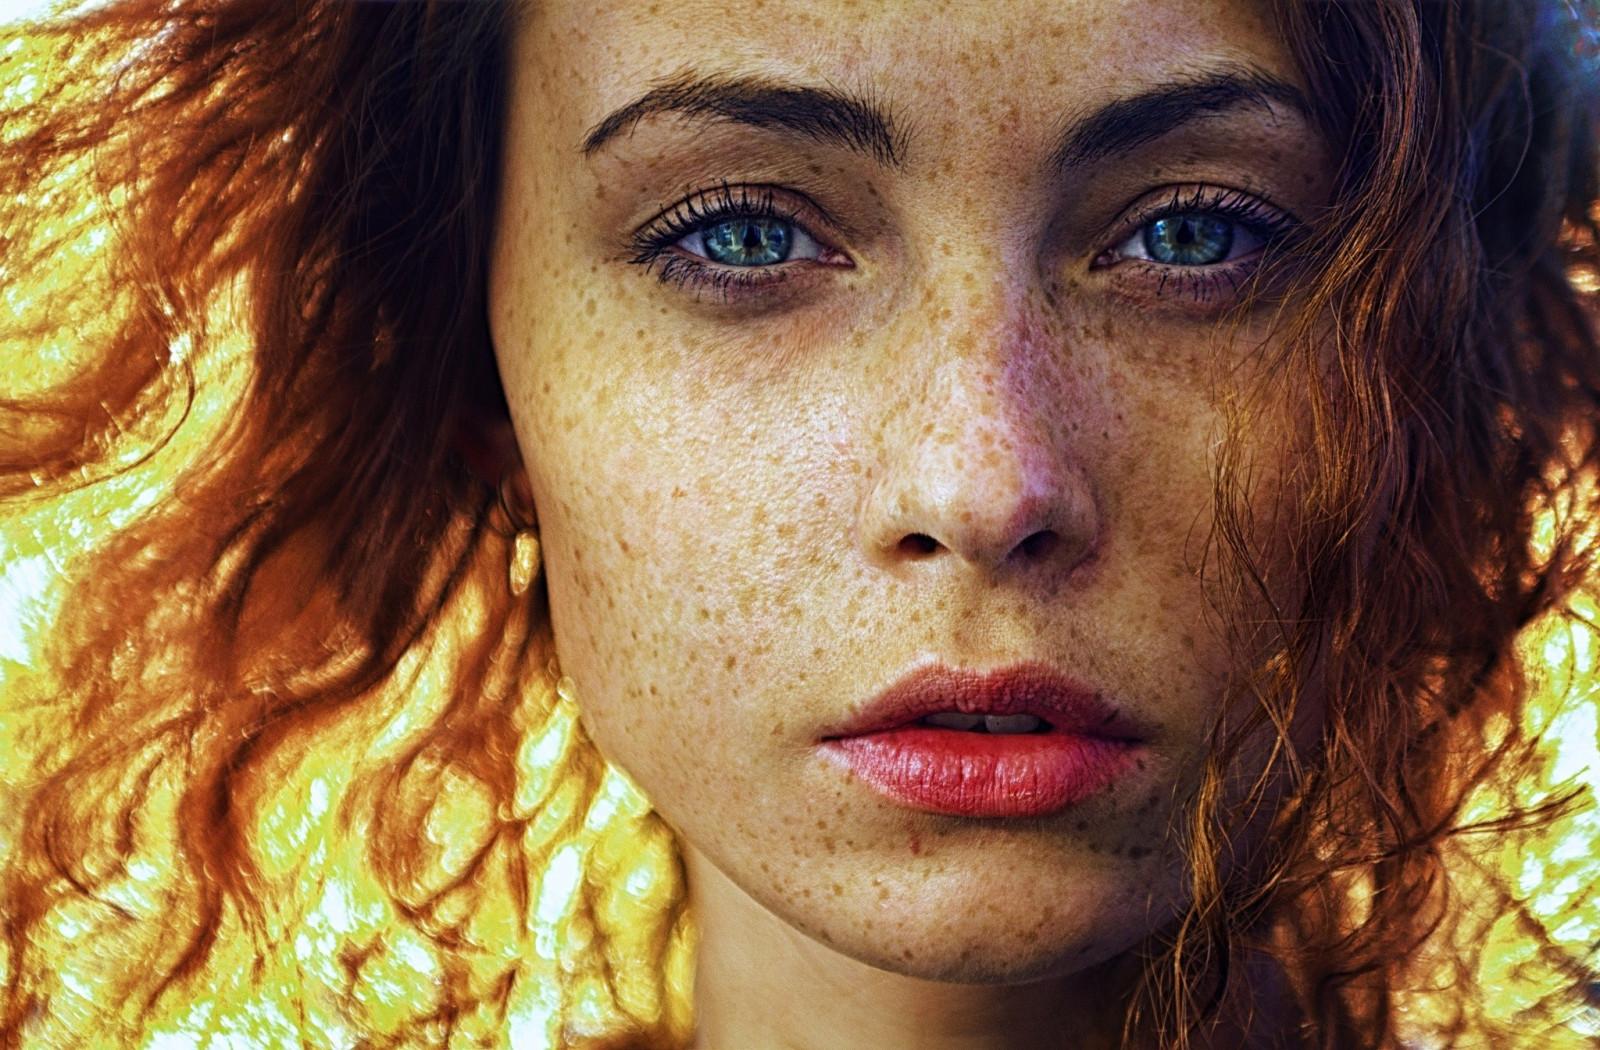 Wallpaper Face Women Model Long Hair Blue Eyes: Wallpaper : Face, Sunlight, Women Outdoors, Redhead, Model